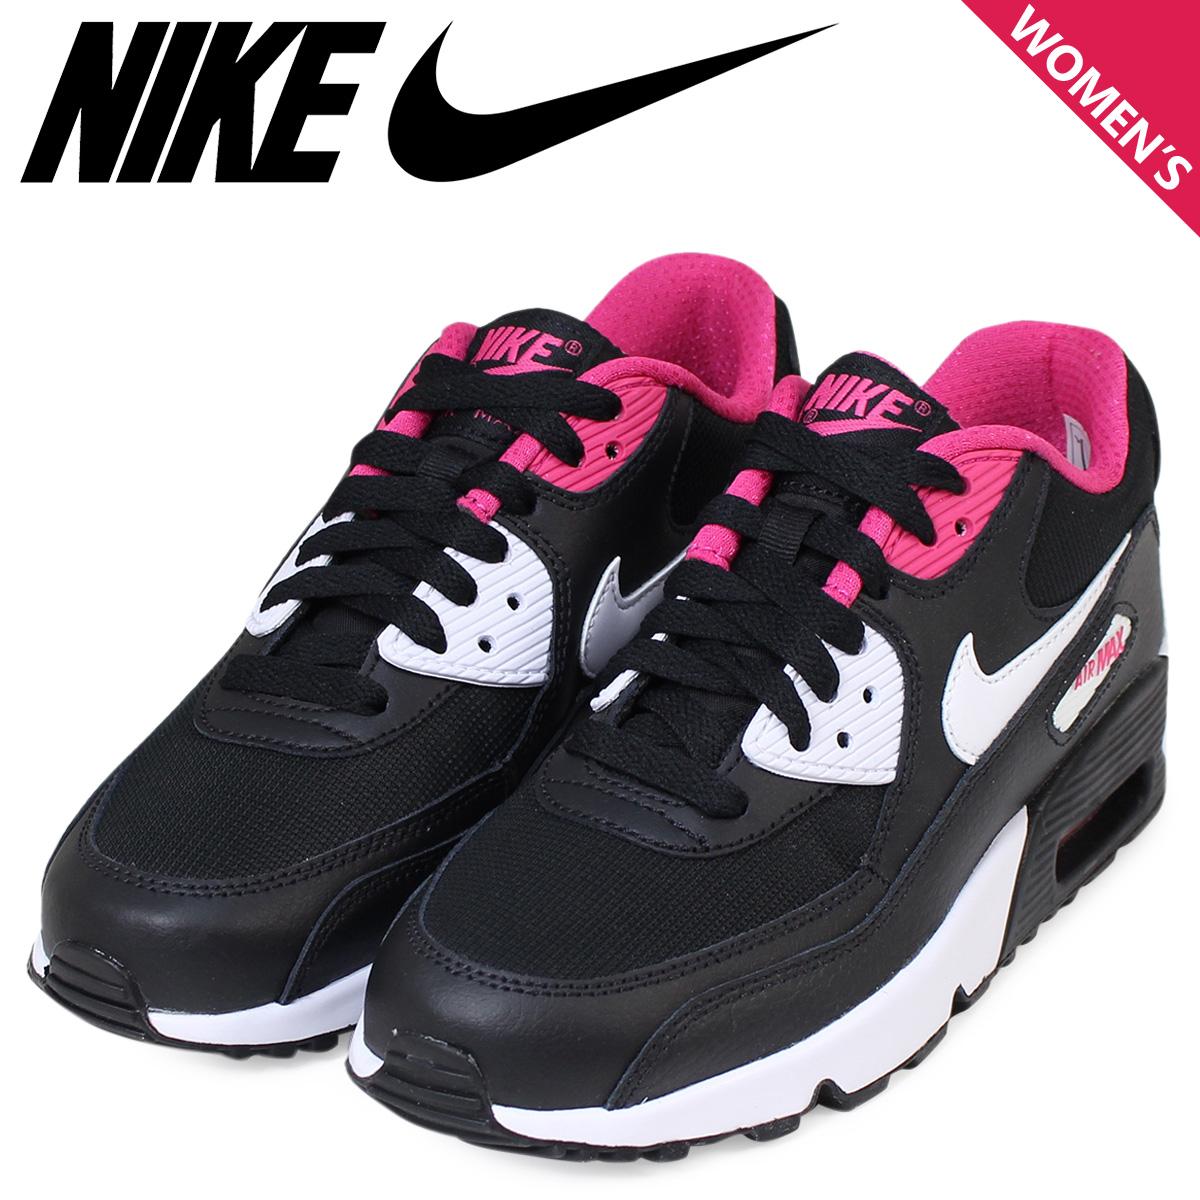 Buy Original Nike Air Max 90 womens Shoes OnlineBillig ekte Cheap Real